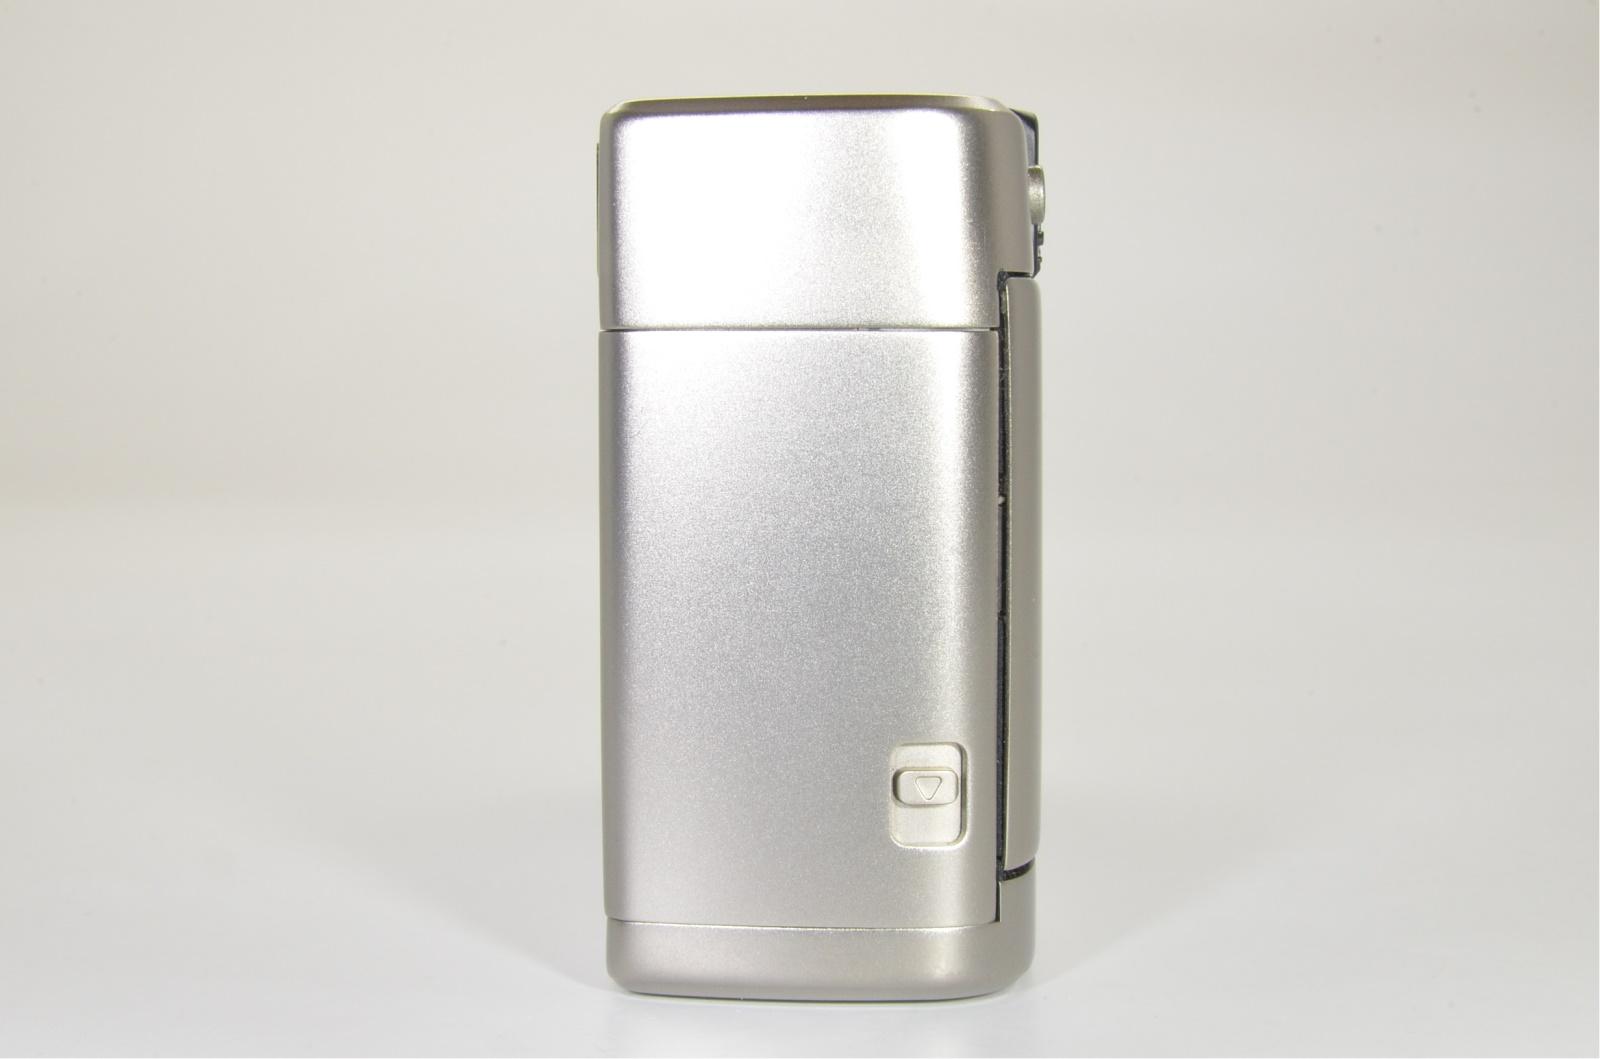 minolta tc-1 point & shoot 35mm film camera 28mm f3.5 shooting tested